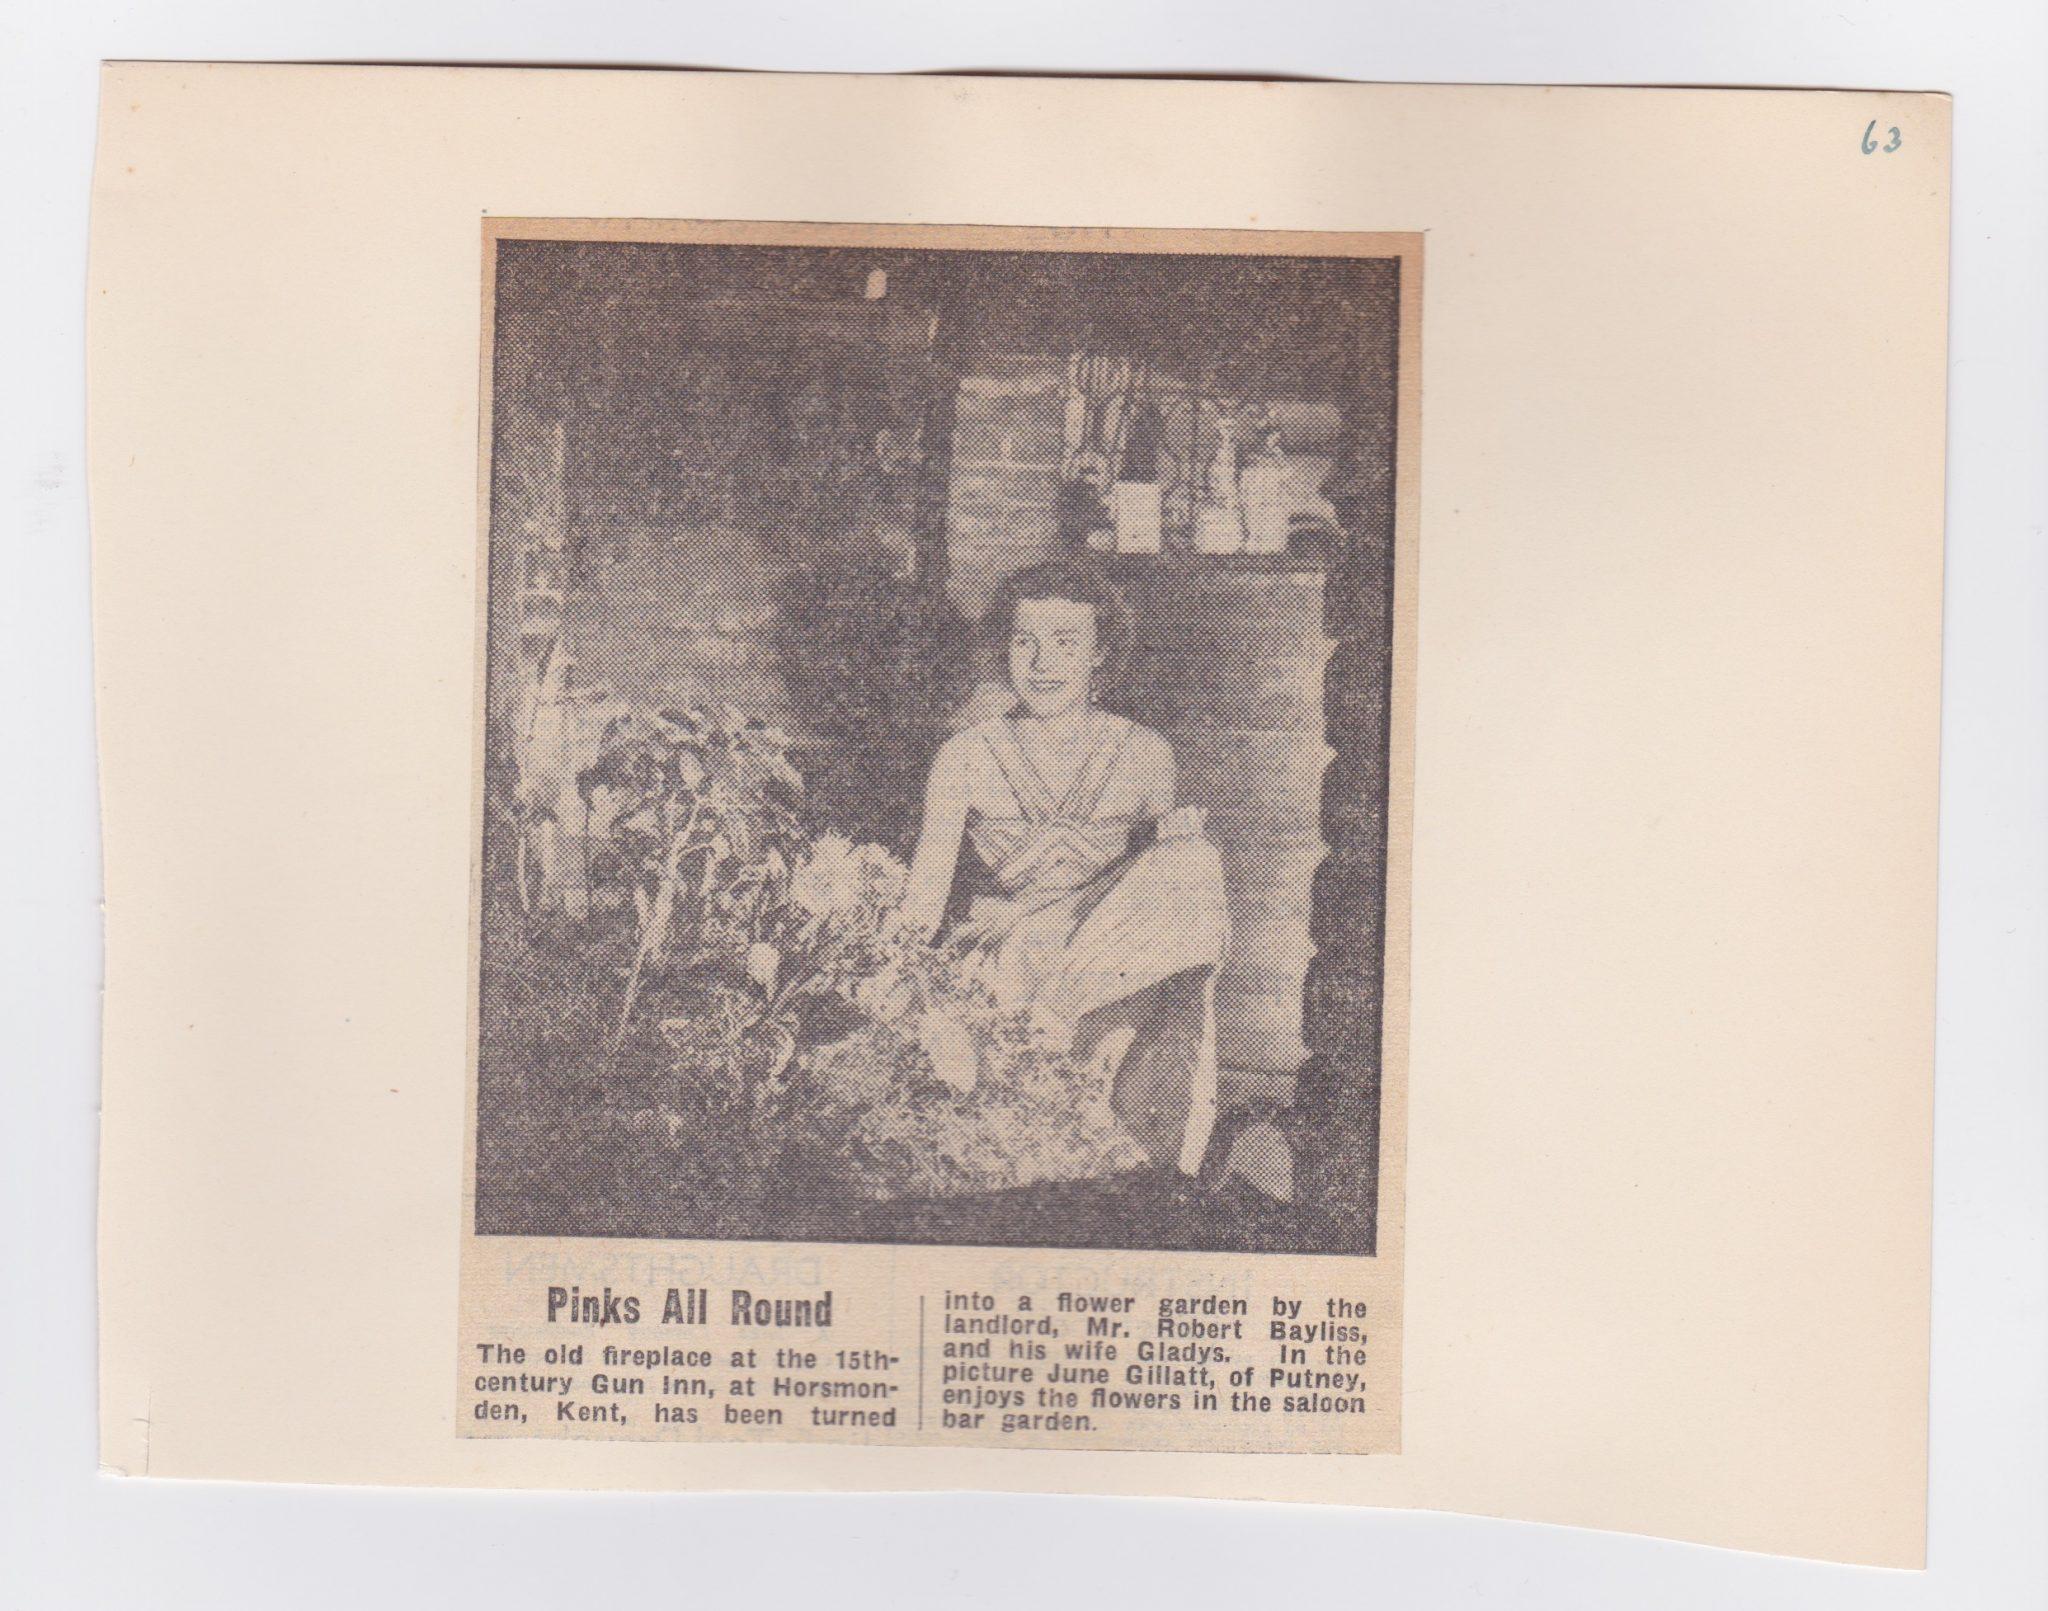 A Pub History Scrapbook Archive 23